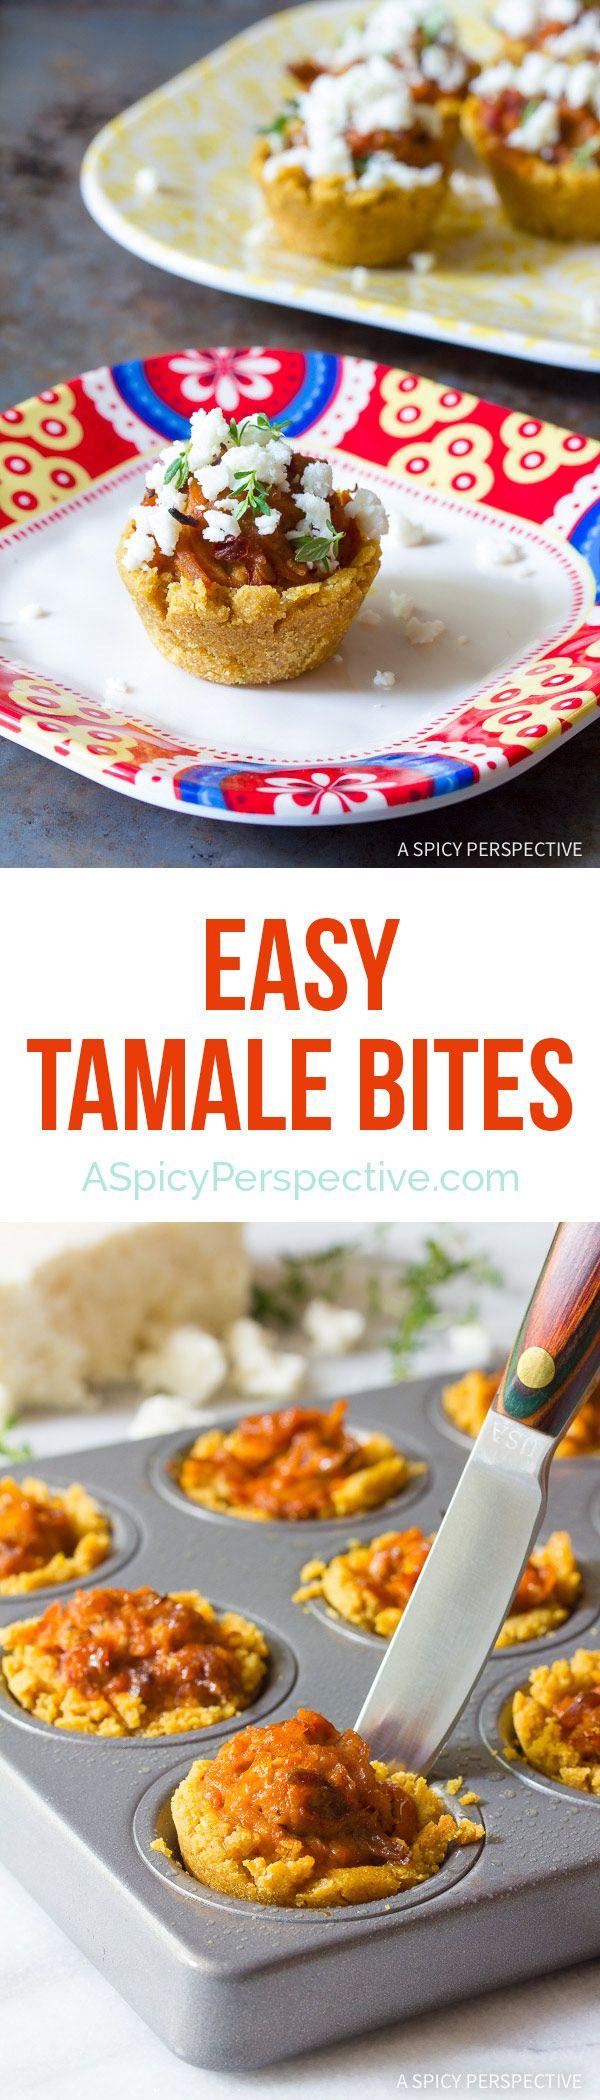 Tamale Bites | Recipe | Tamales, Recipe and Perspective